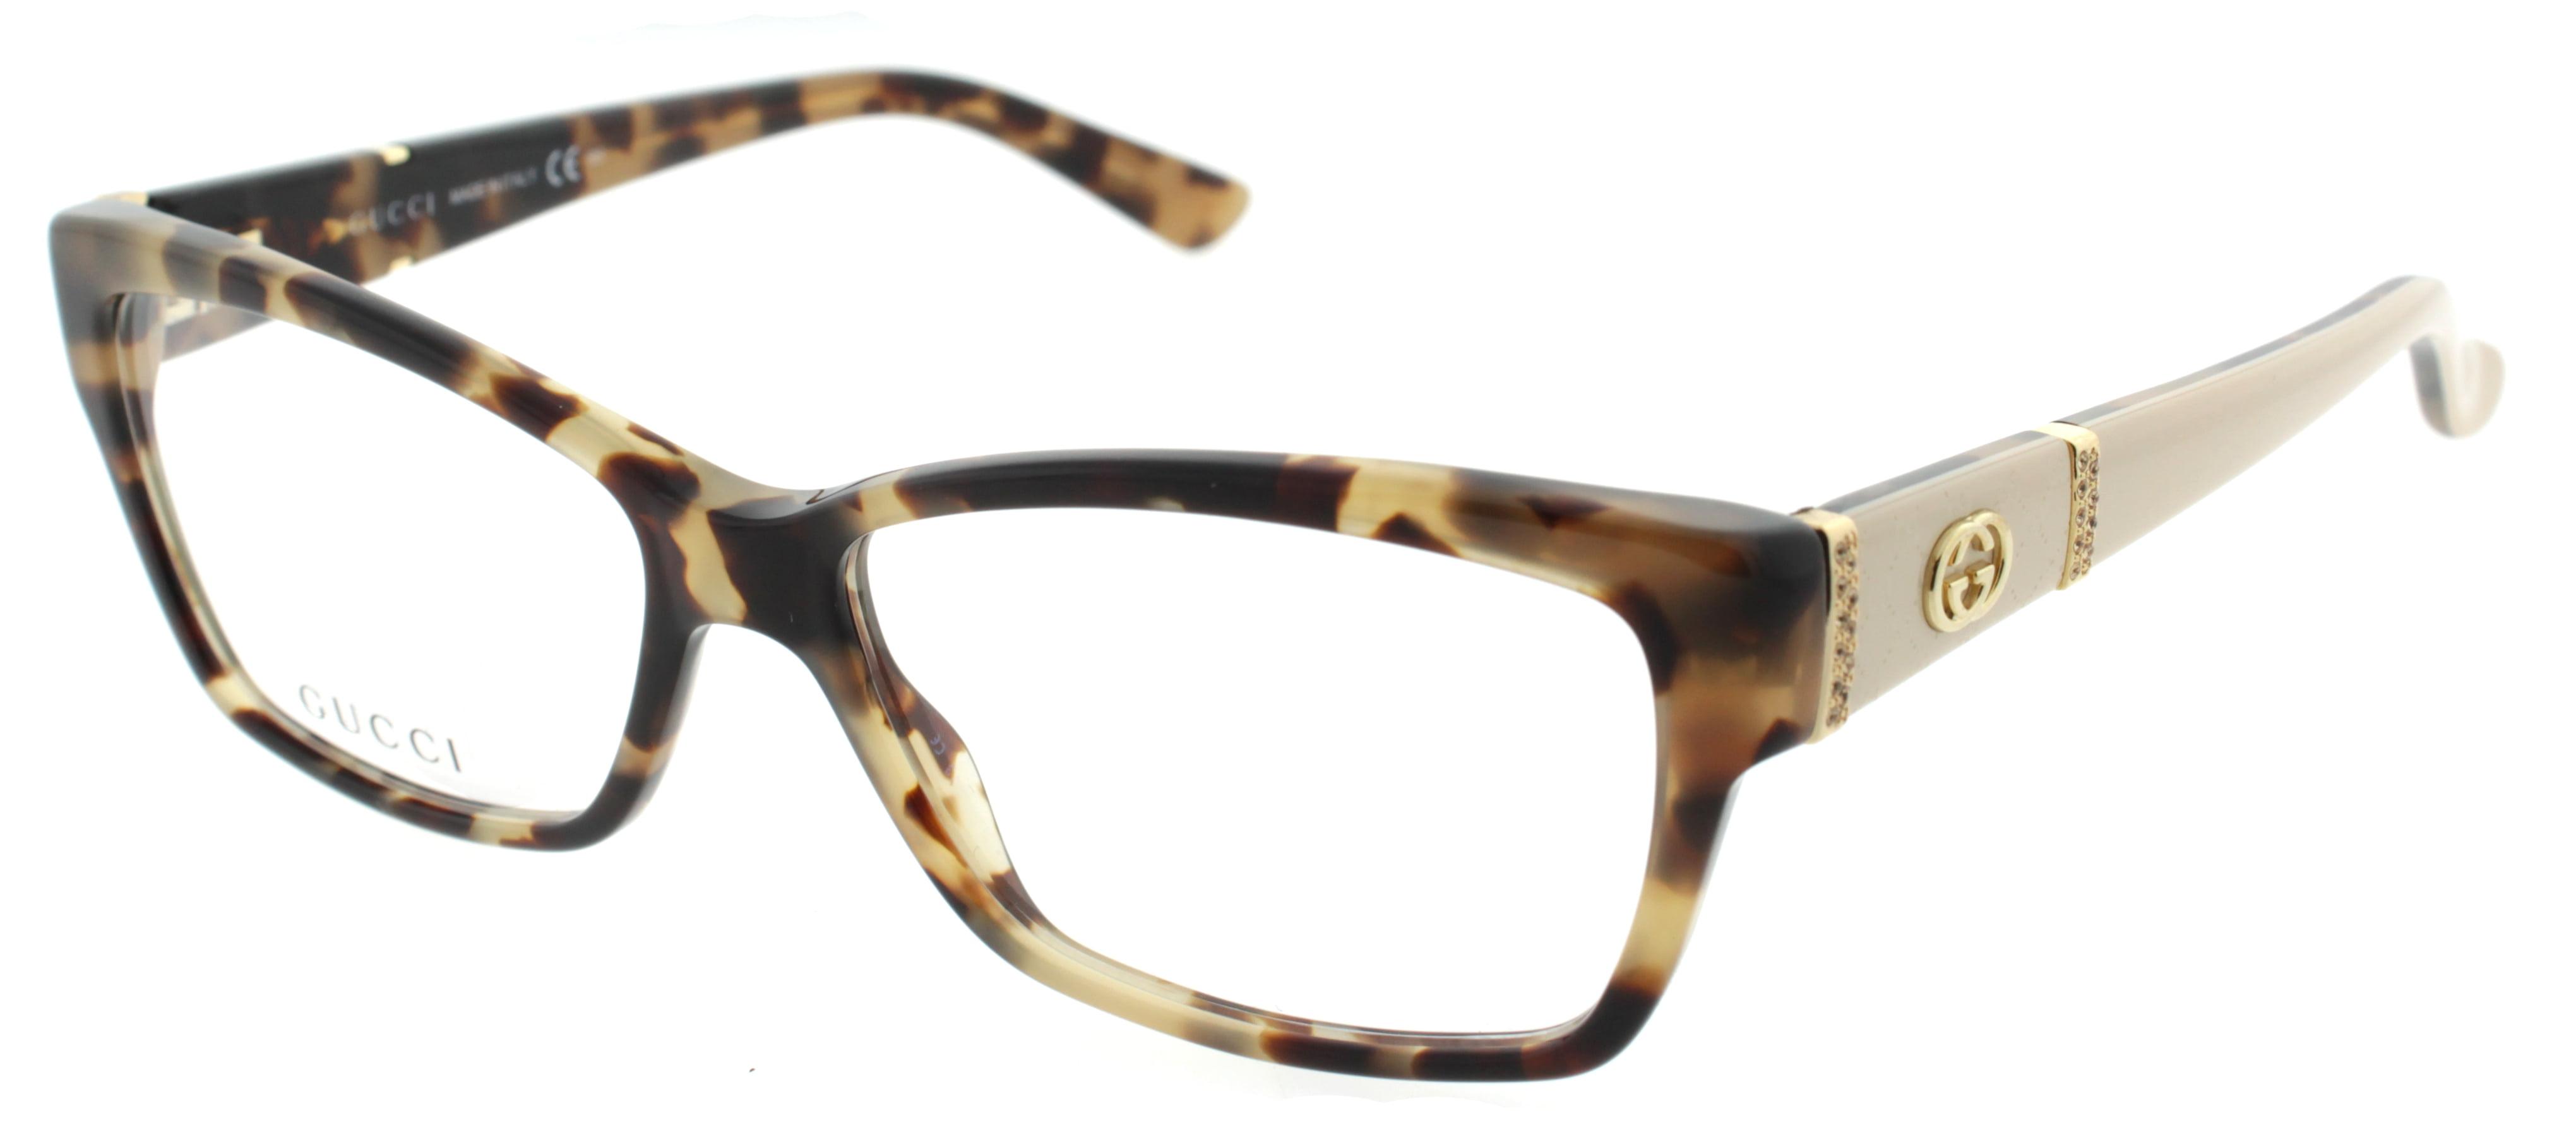 gucci gg 3559 l7b 53mm havana brown honey gold womens eyeglasses walmartcom - Womens Gucci Frames